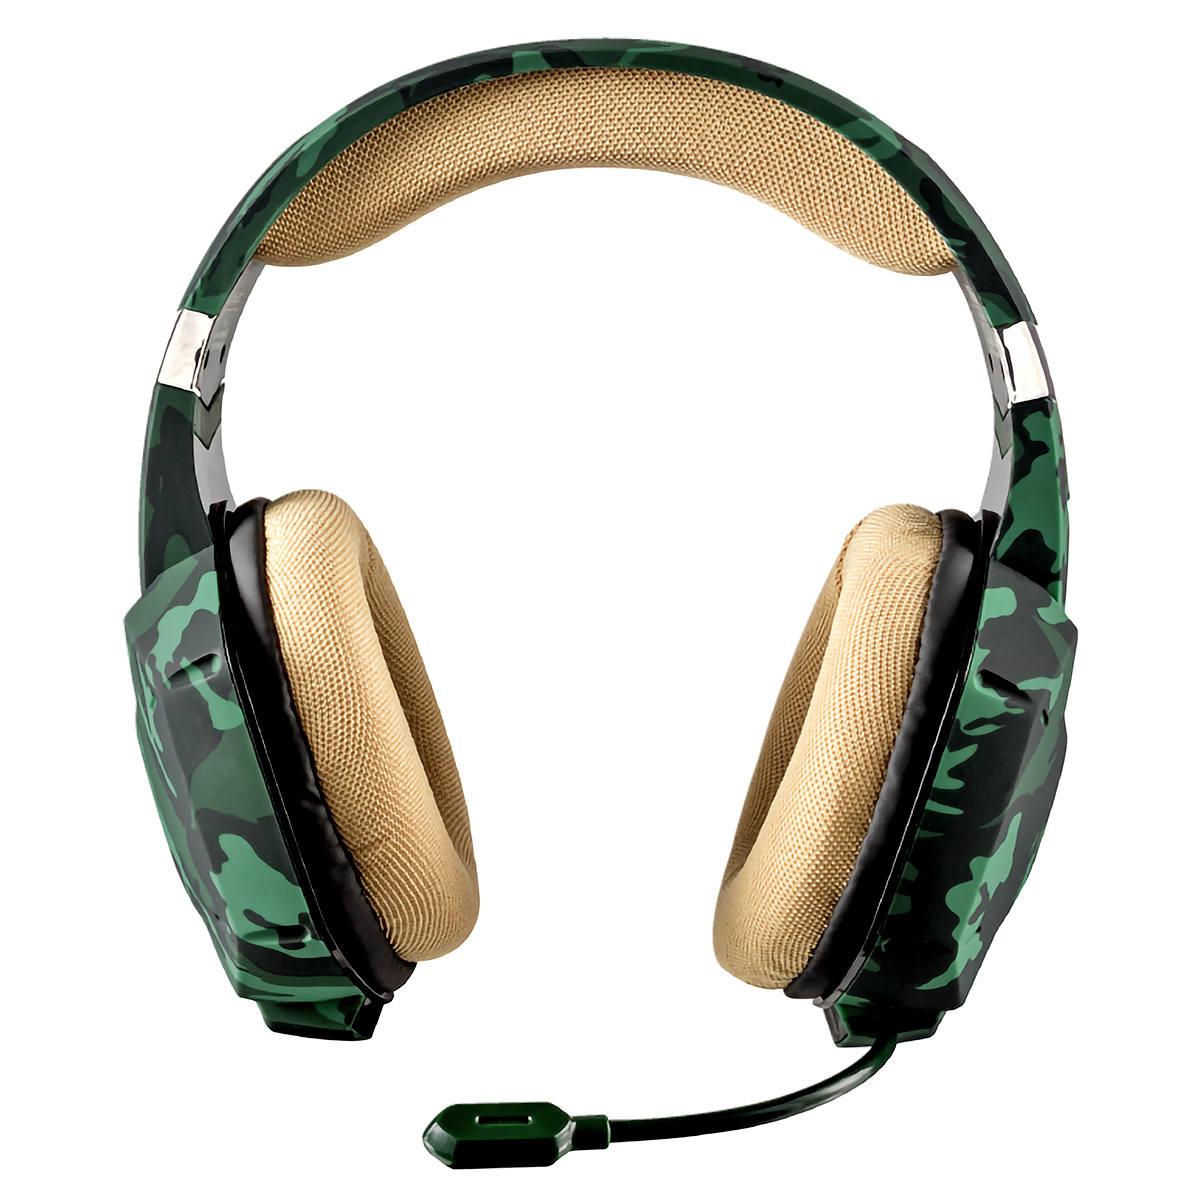 Headset Gaming Carus Multiplataforma Som Potente Drivers 50mm Cabo 2 metros Trust GXT 322C Jungle Camo Camuflado